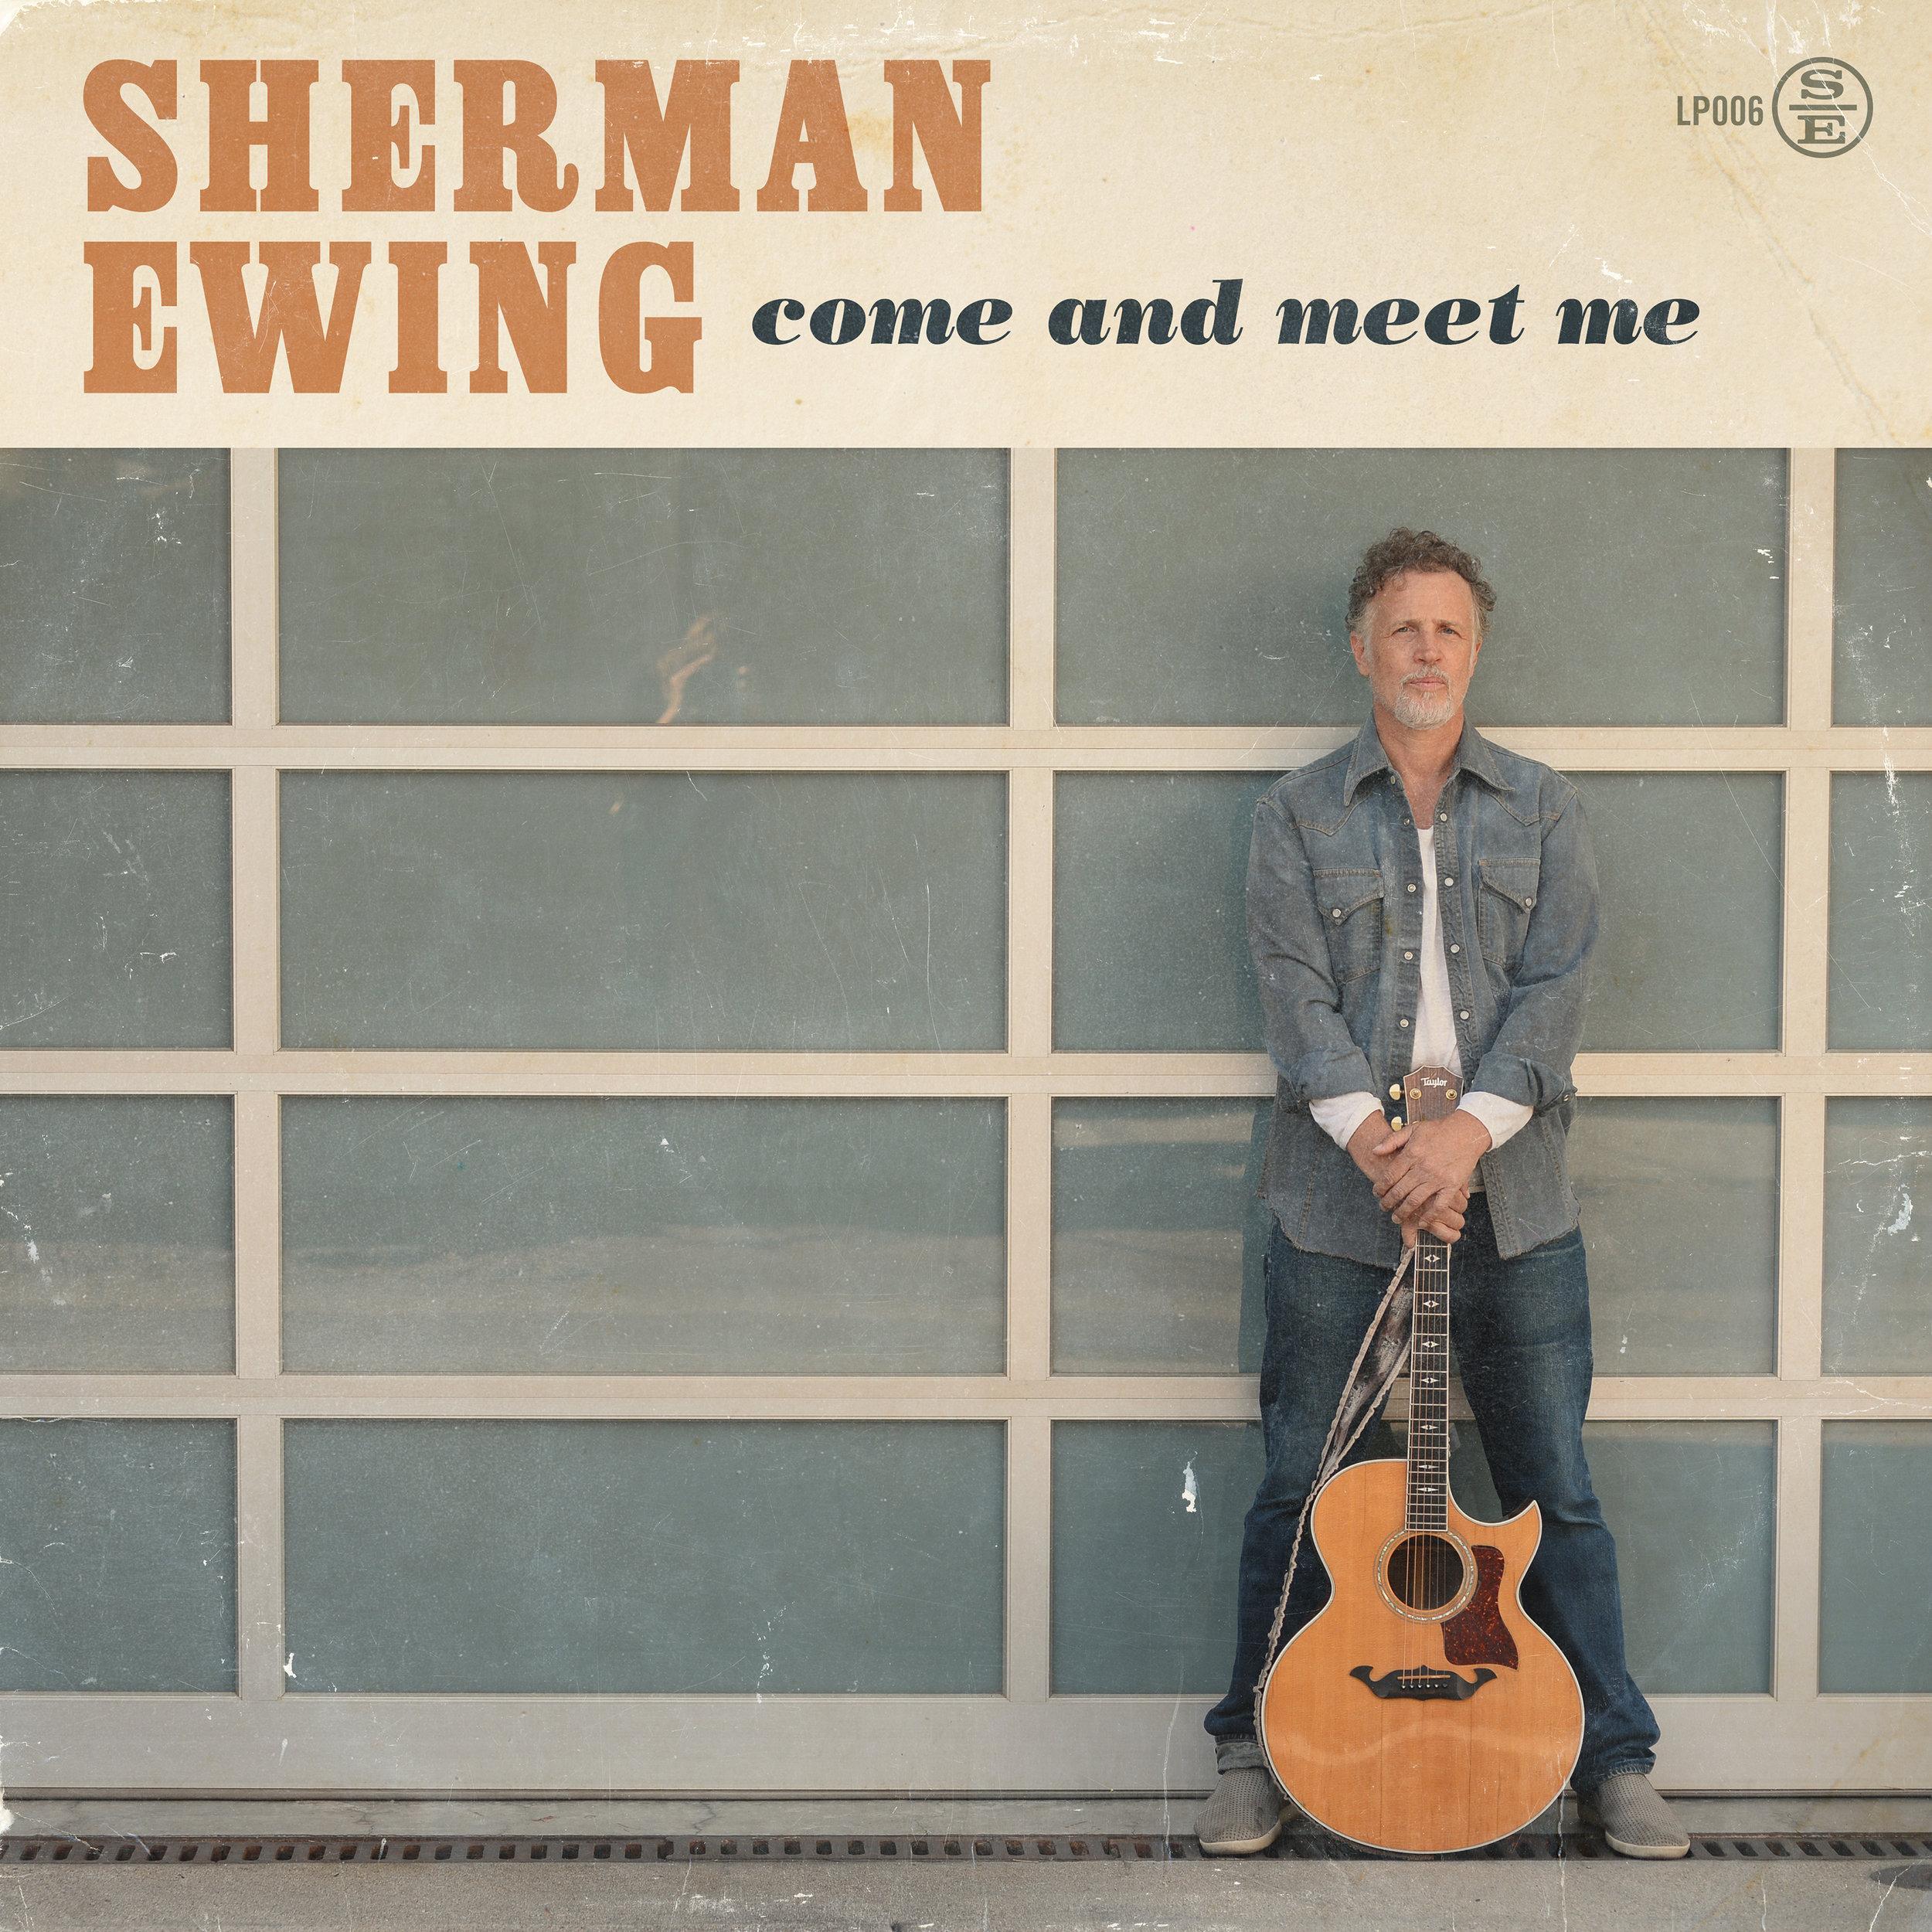 ShermanEwing-ComeandMeetMe_cover.jpg